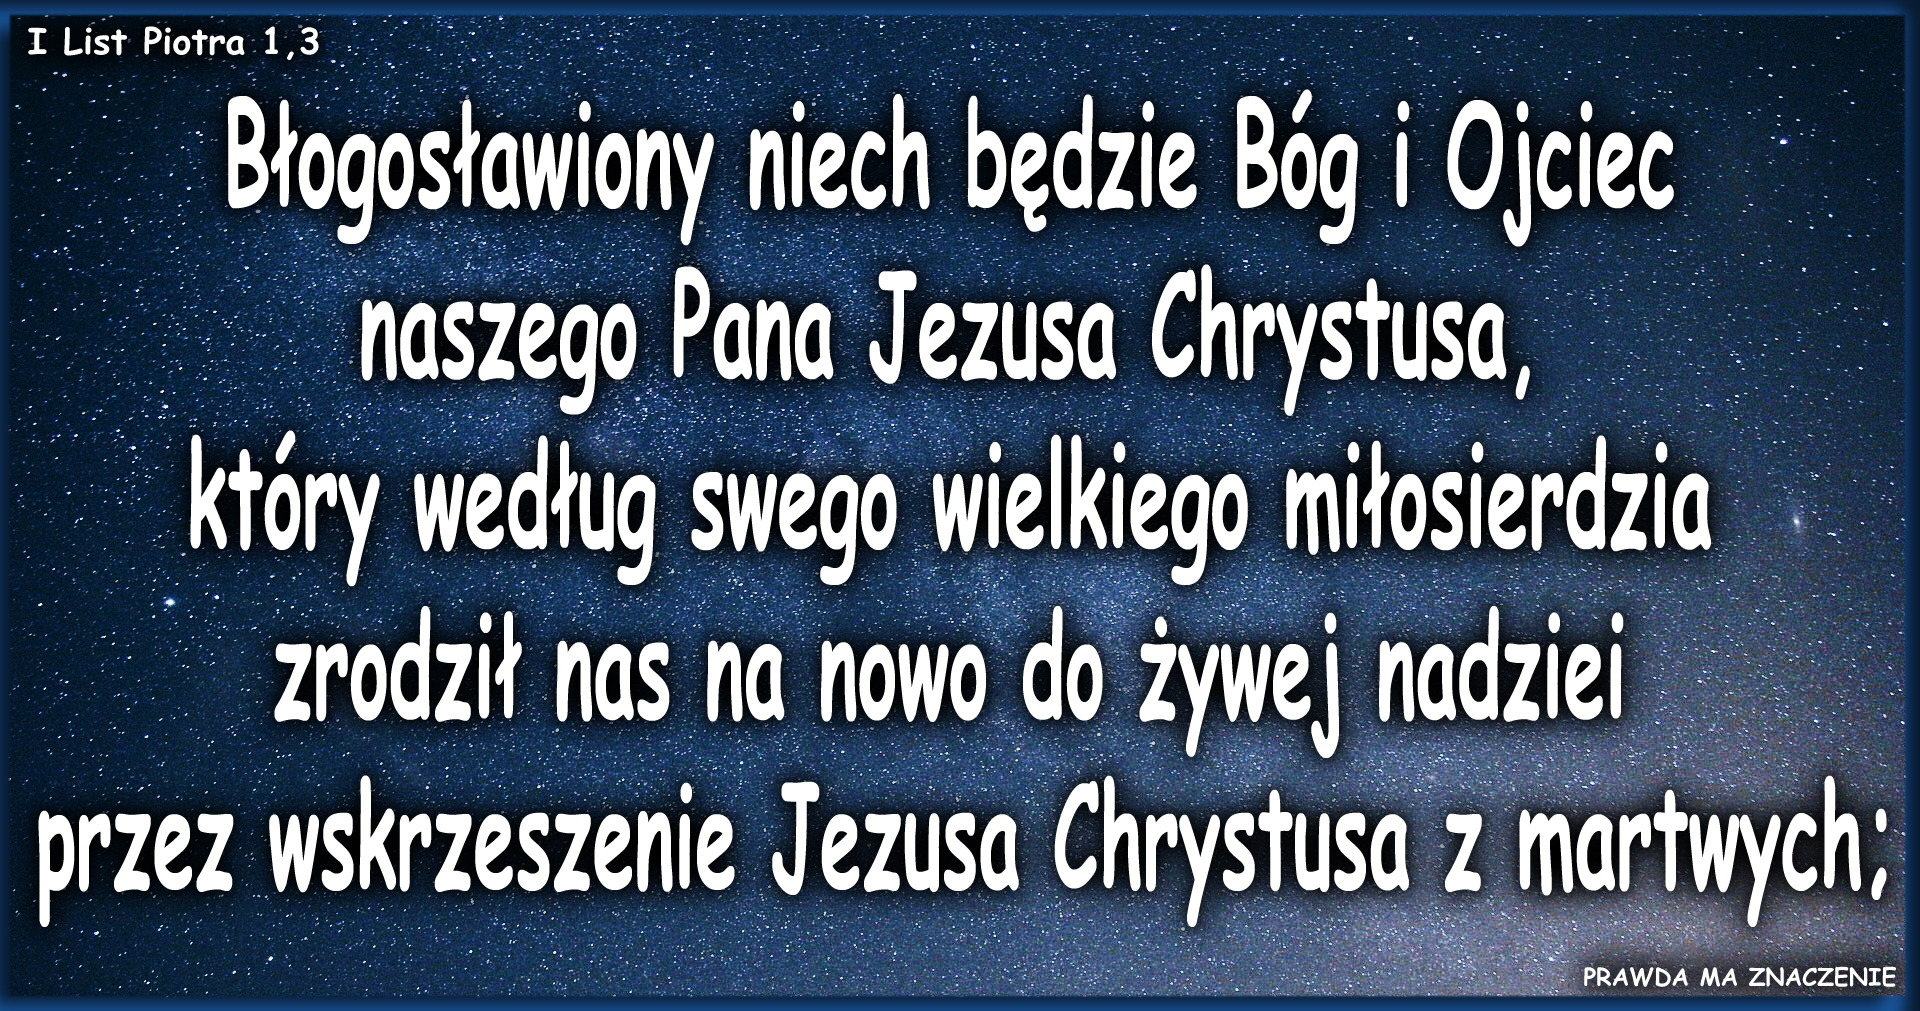 I List Piotra 1 3